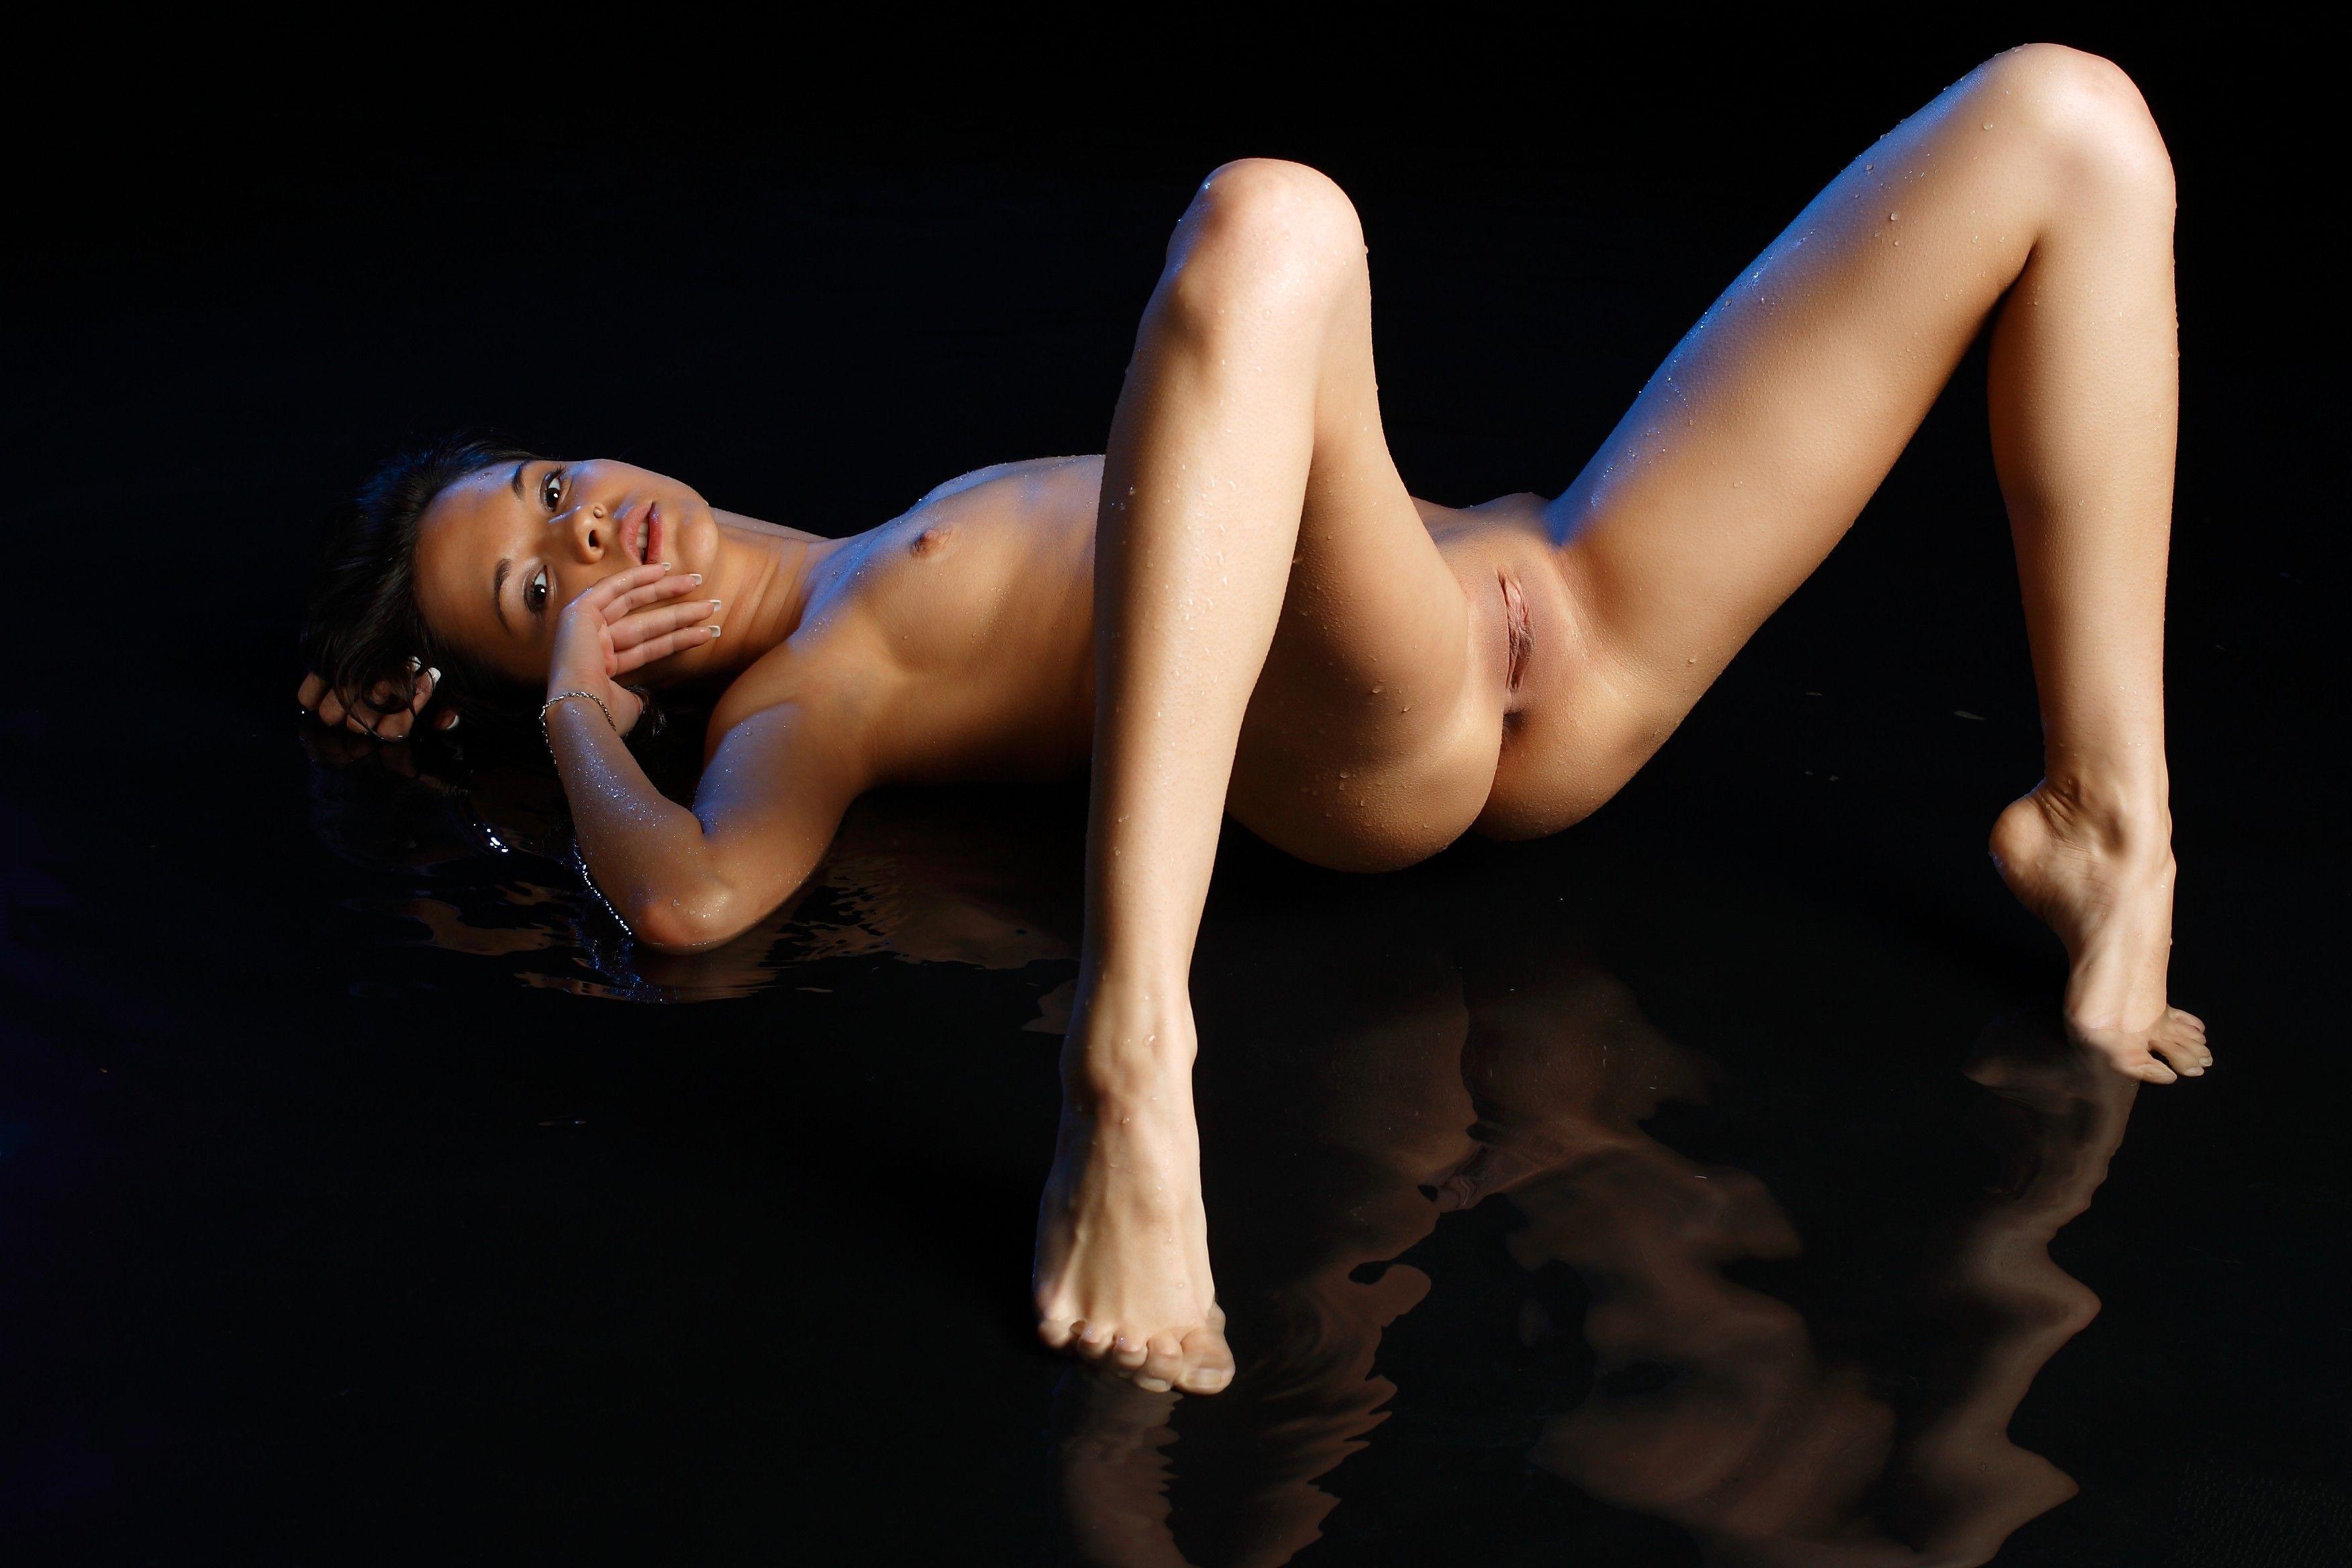 les belles femme nue fellations france